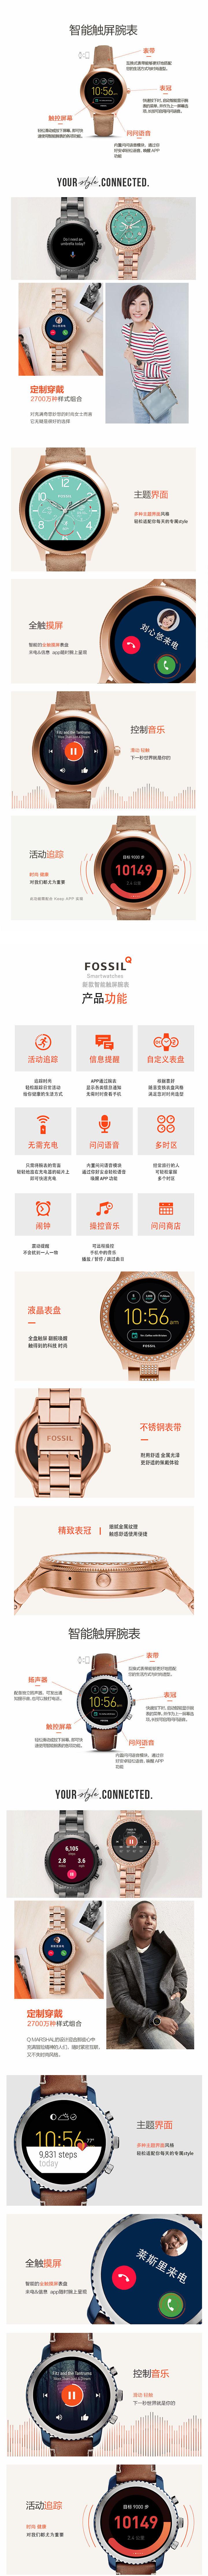 FOSSIL Q智能触屏腕表免费试用,评测